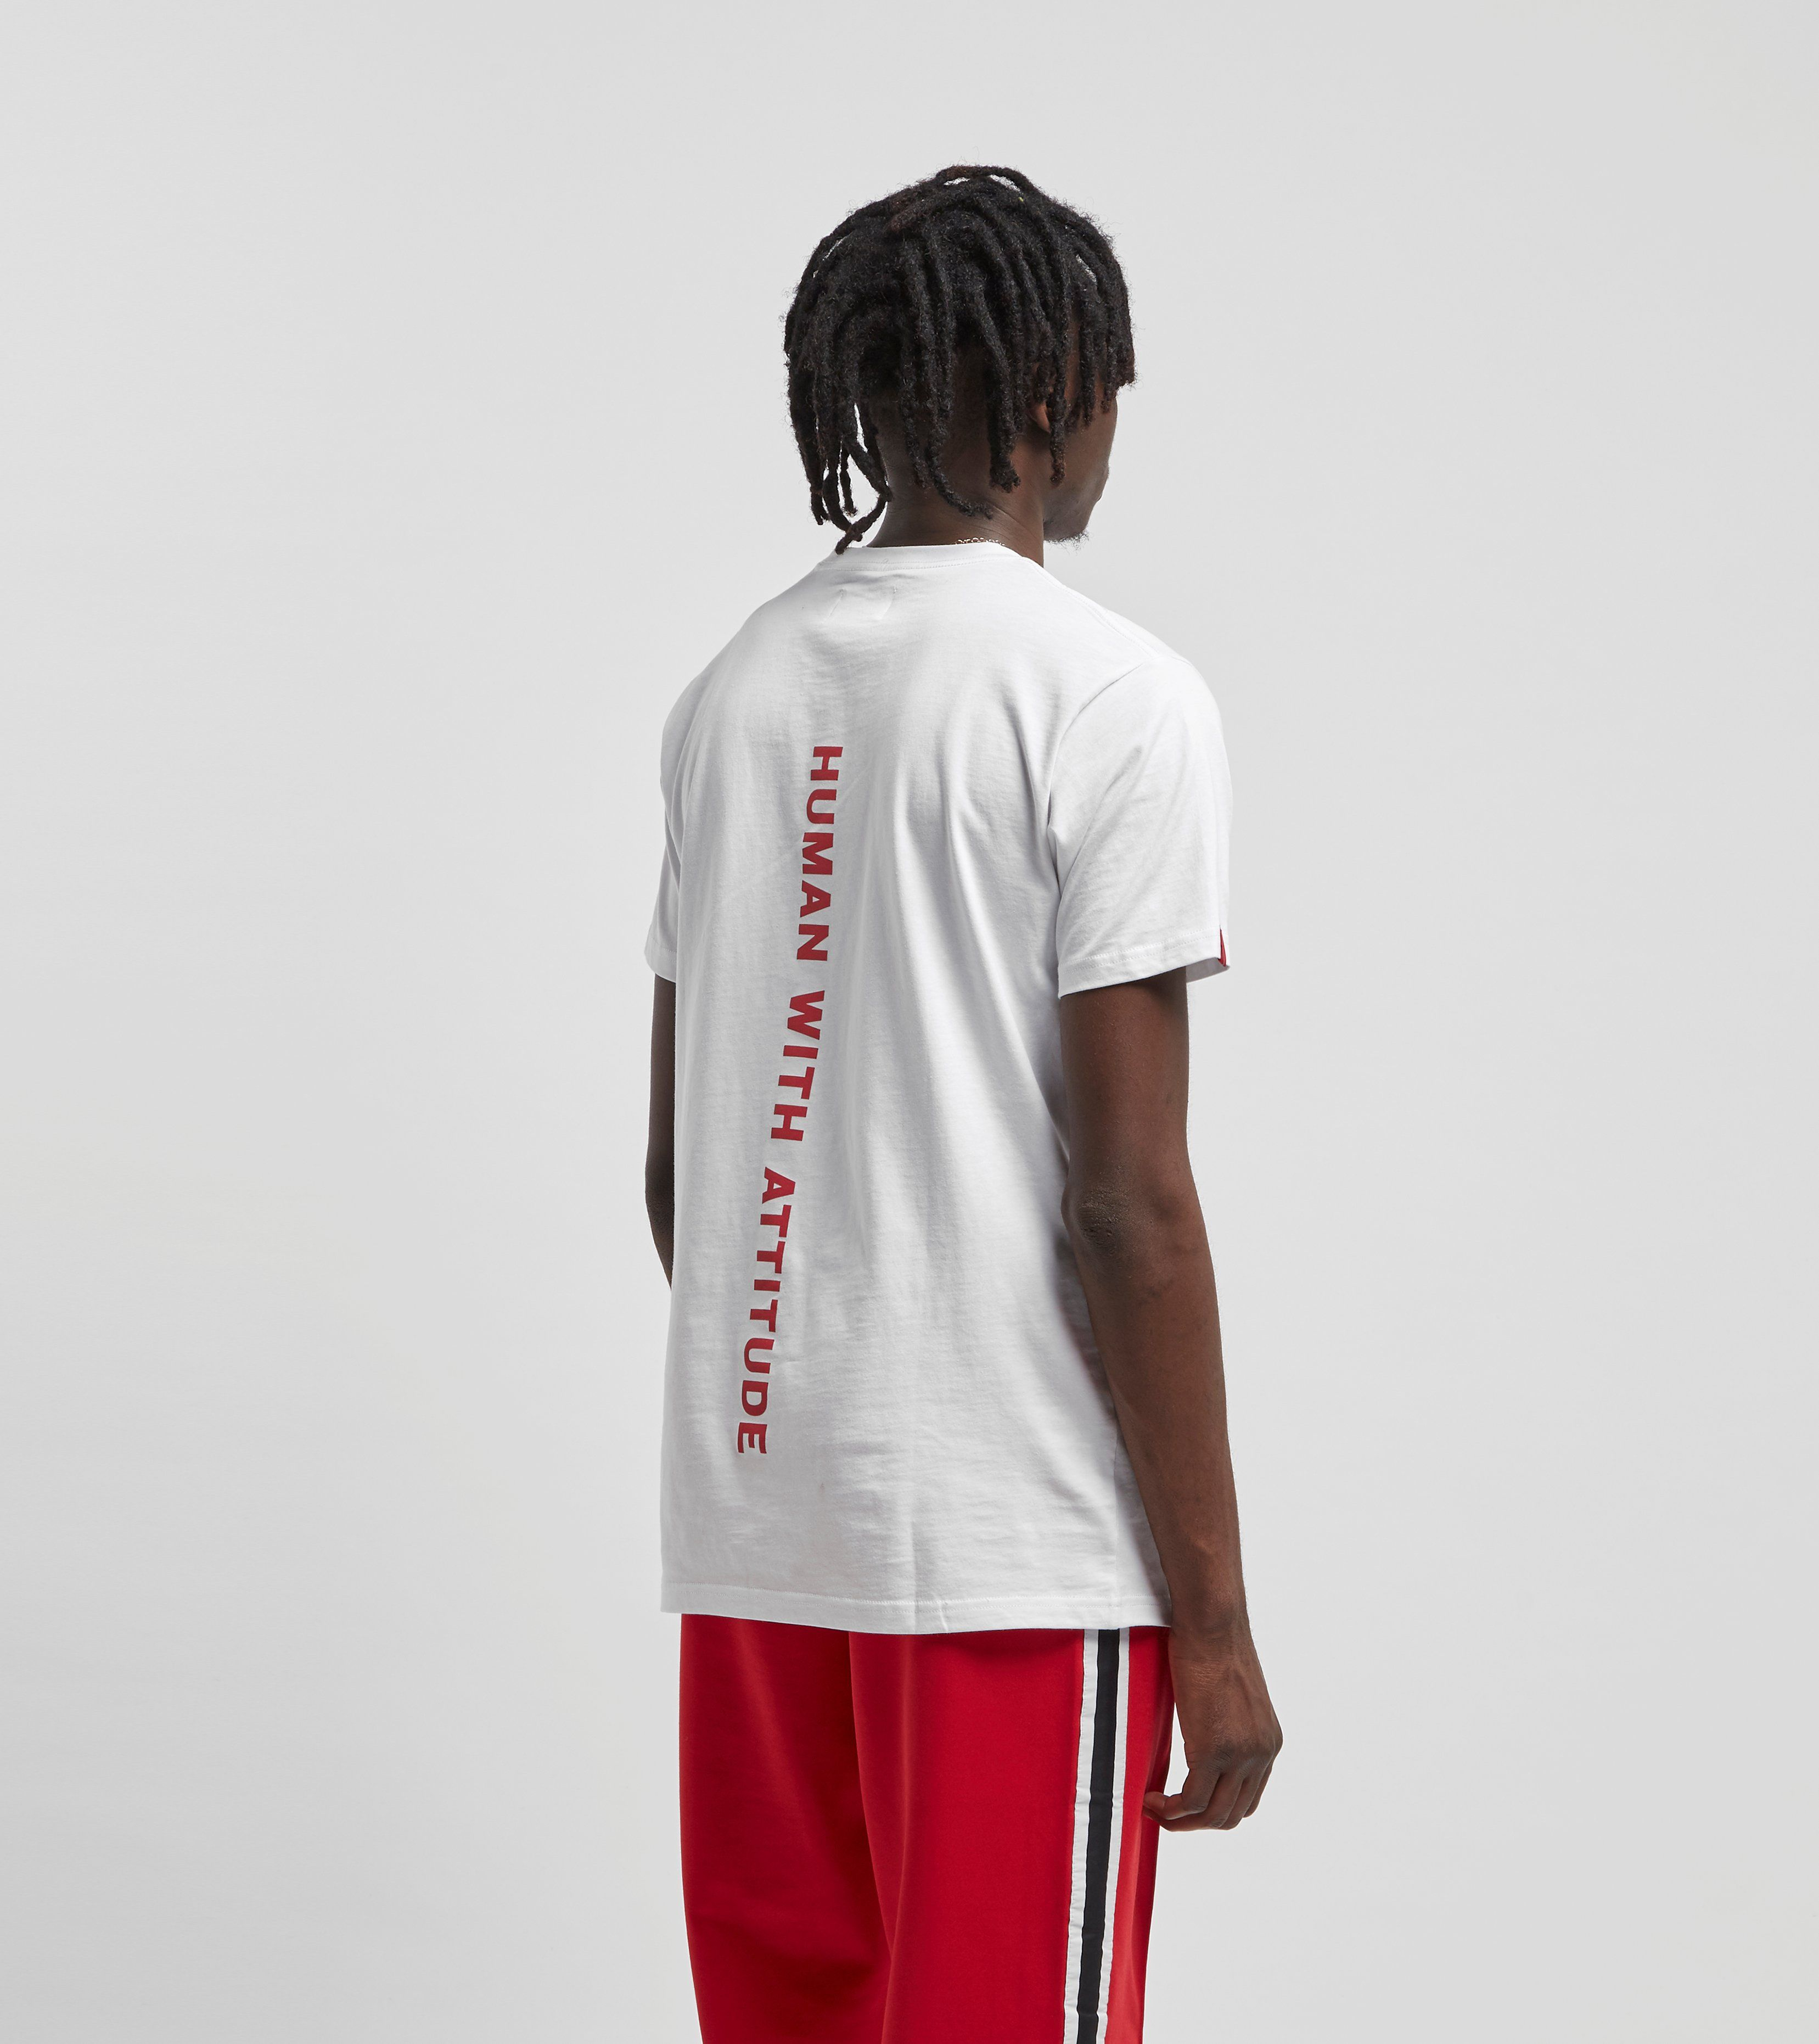 Human With Attitude Warning T-Shirt